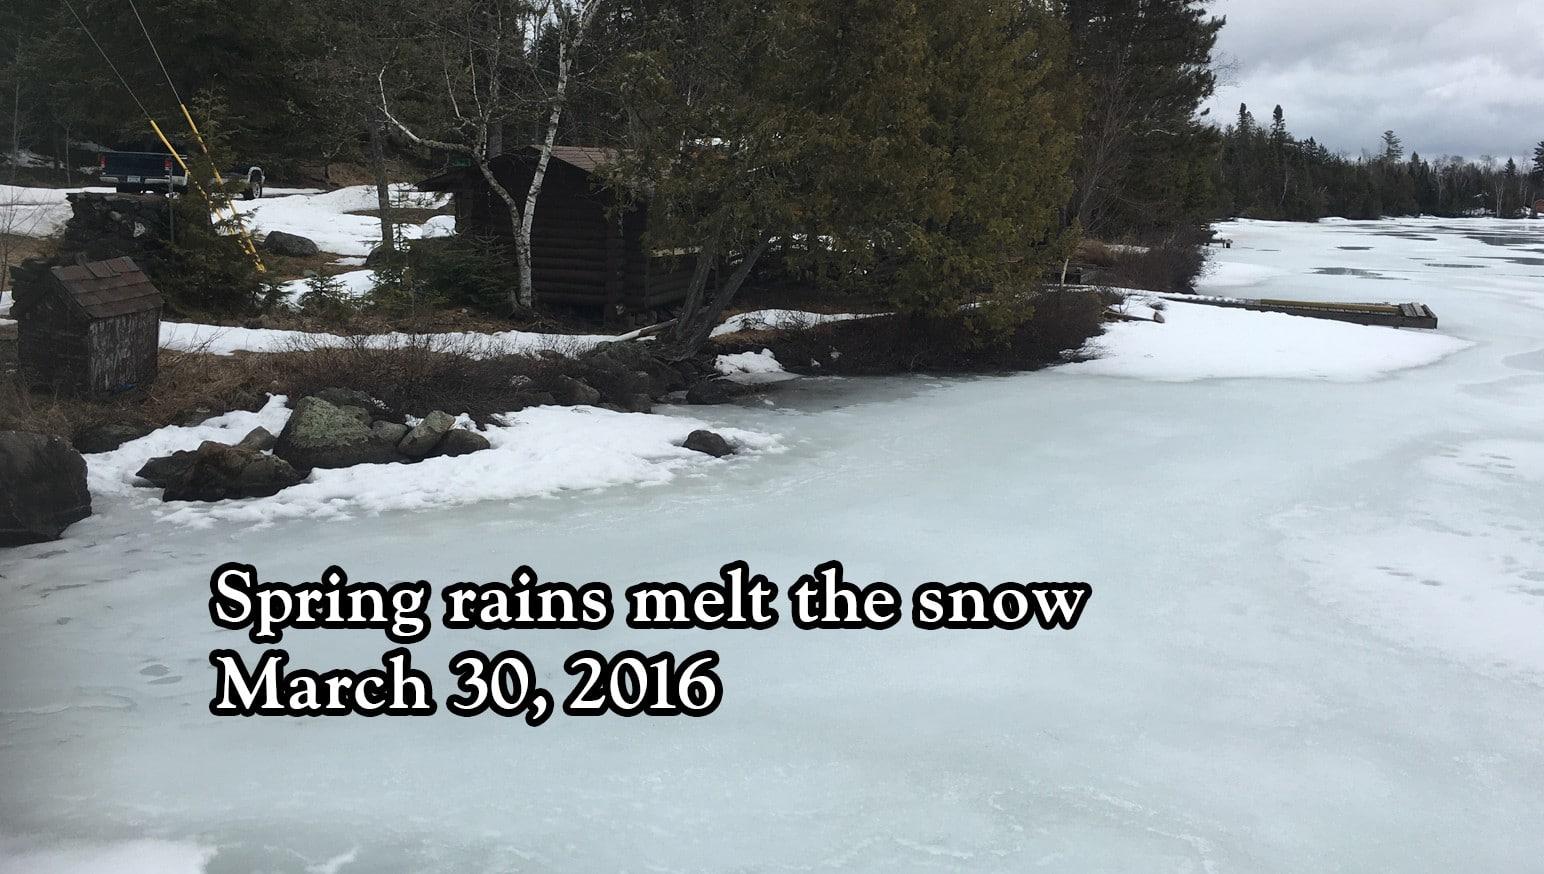 Spring rains melt the snow